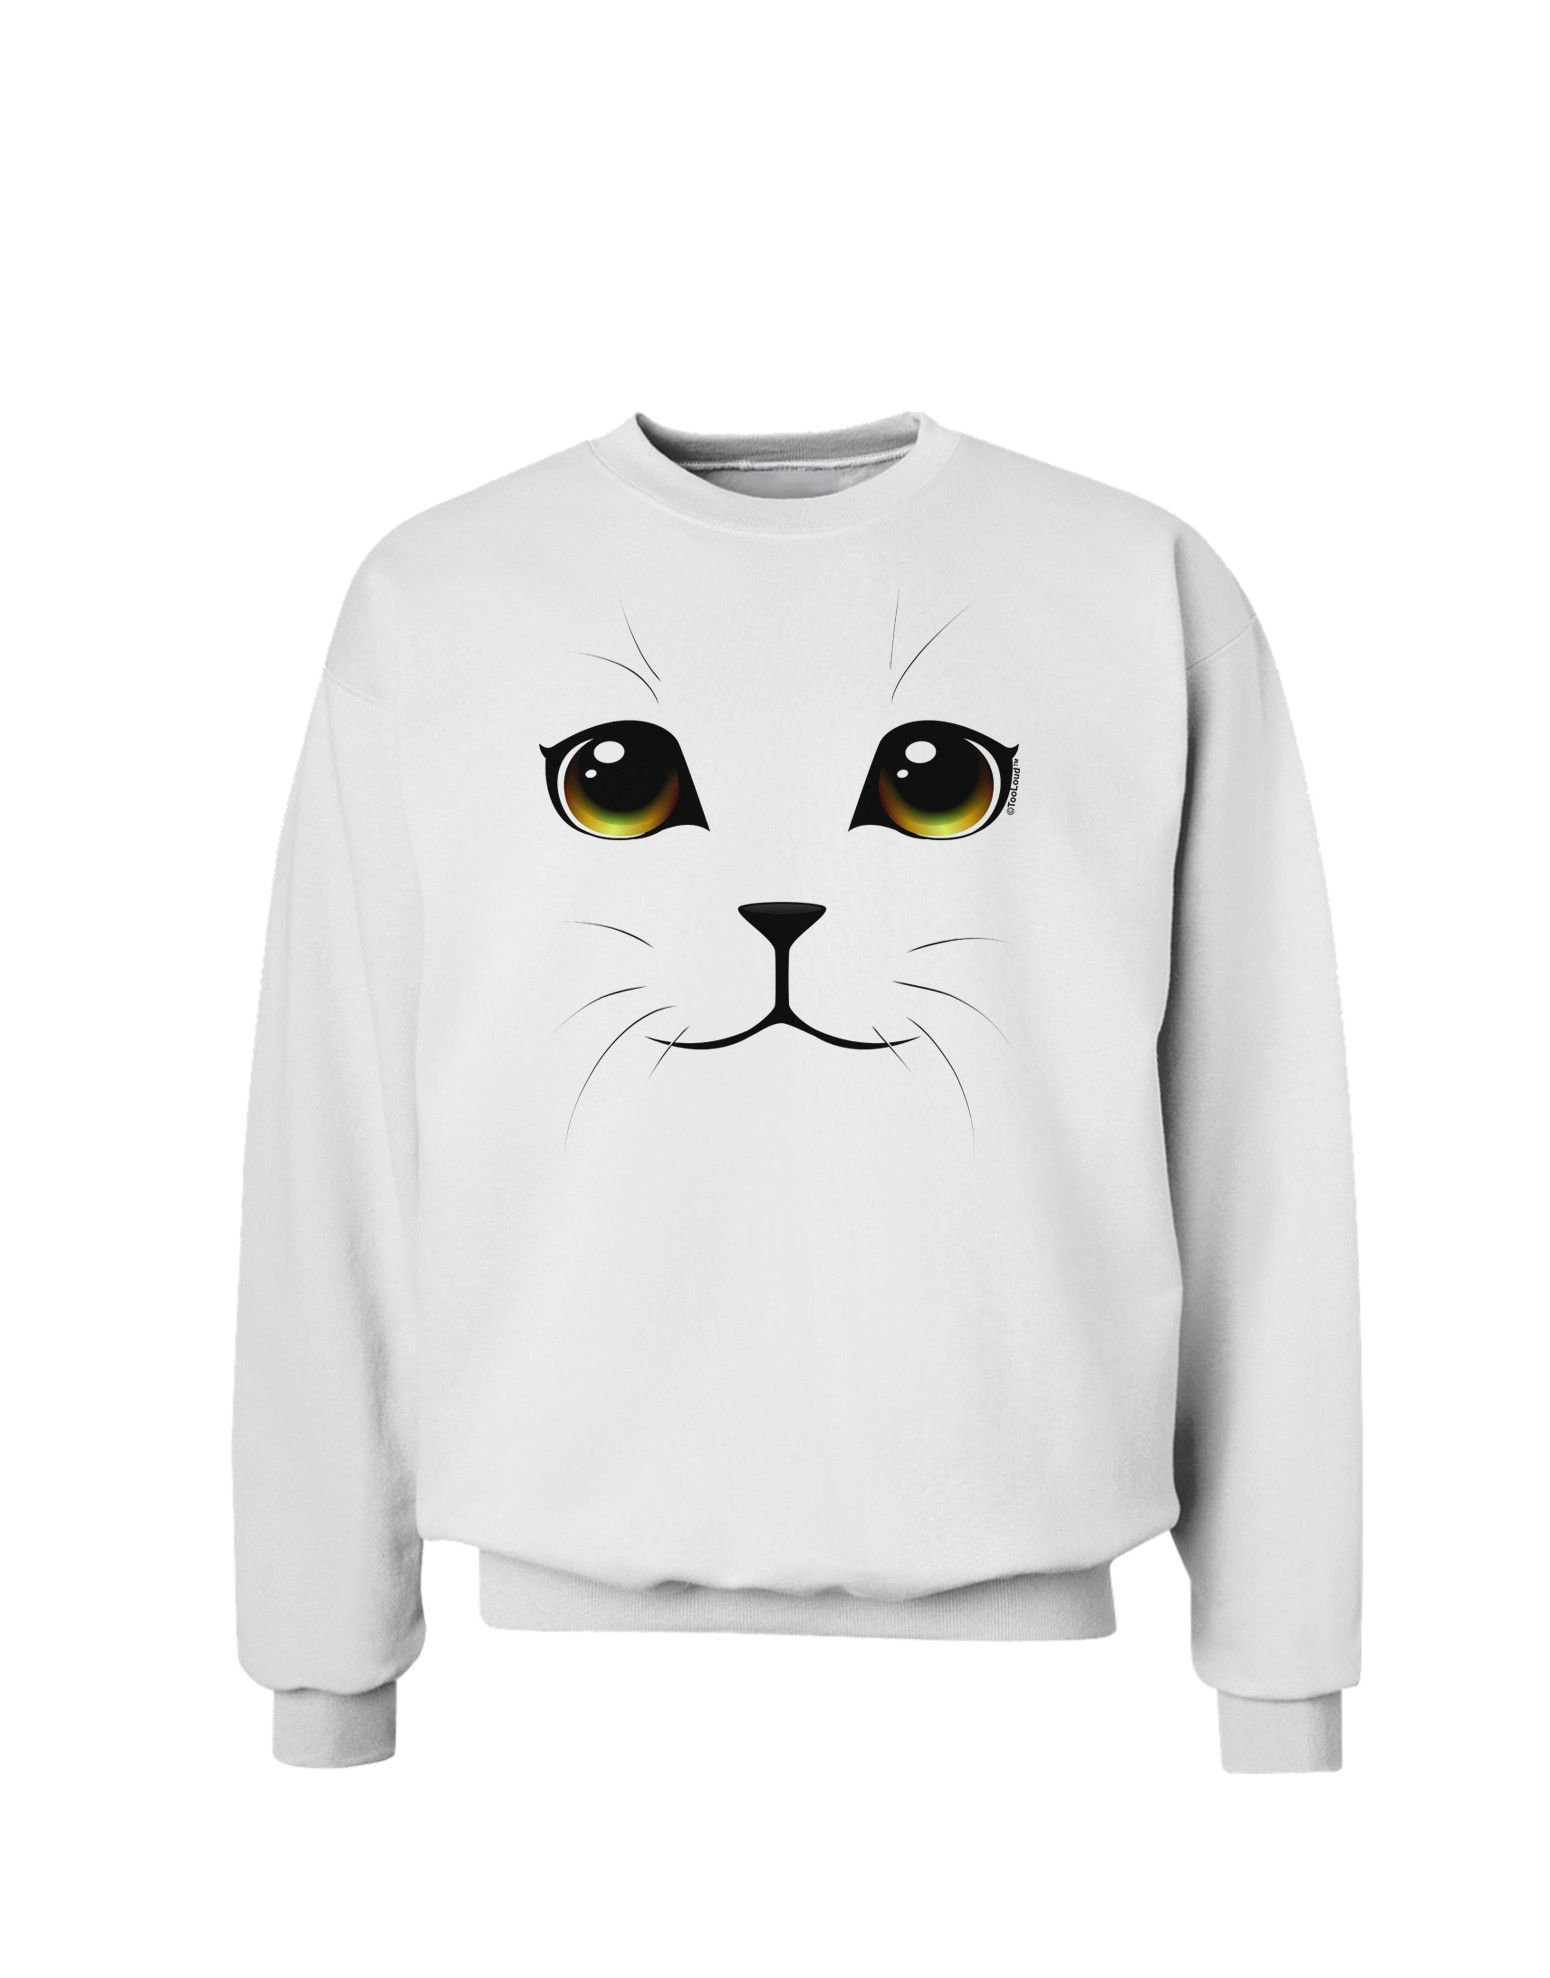 Yellow Amber Eyed Cute Cat Face Sweatshirt Cute Cat Face Cat Face Sweatshirts [ 1978 x 1550 Pixel ]